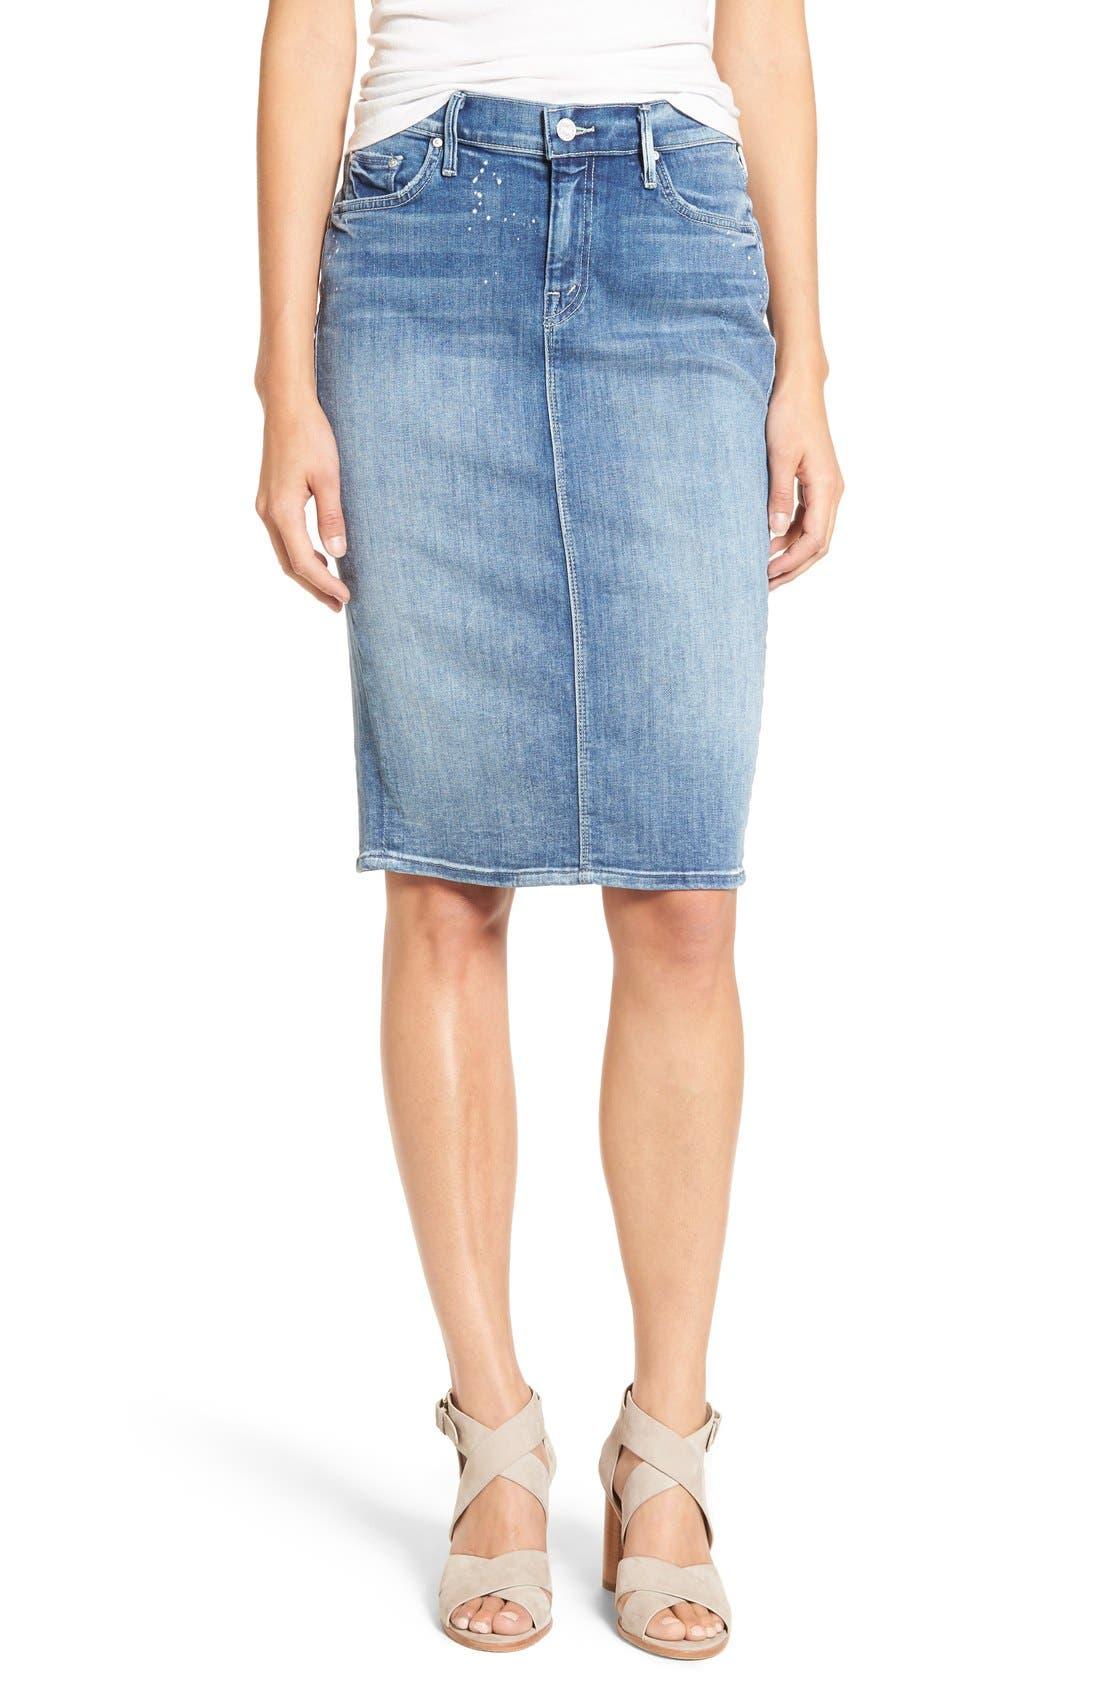 Alternate Image 1 Selected - MOTHER 'The Peg Leg' Denim Pencil Skirt (Double Time)